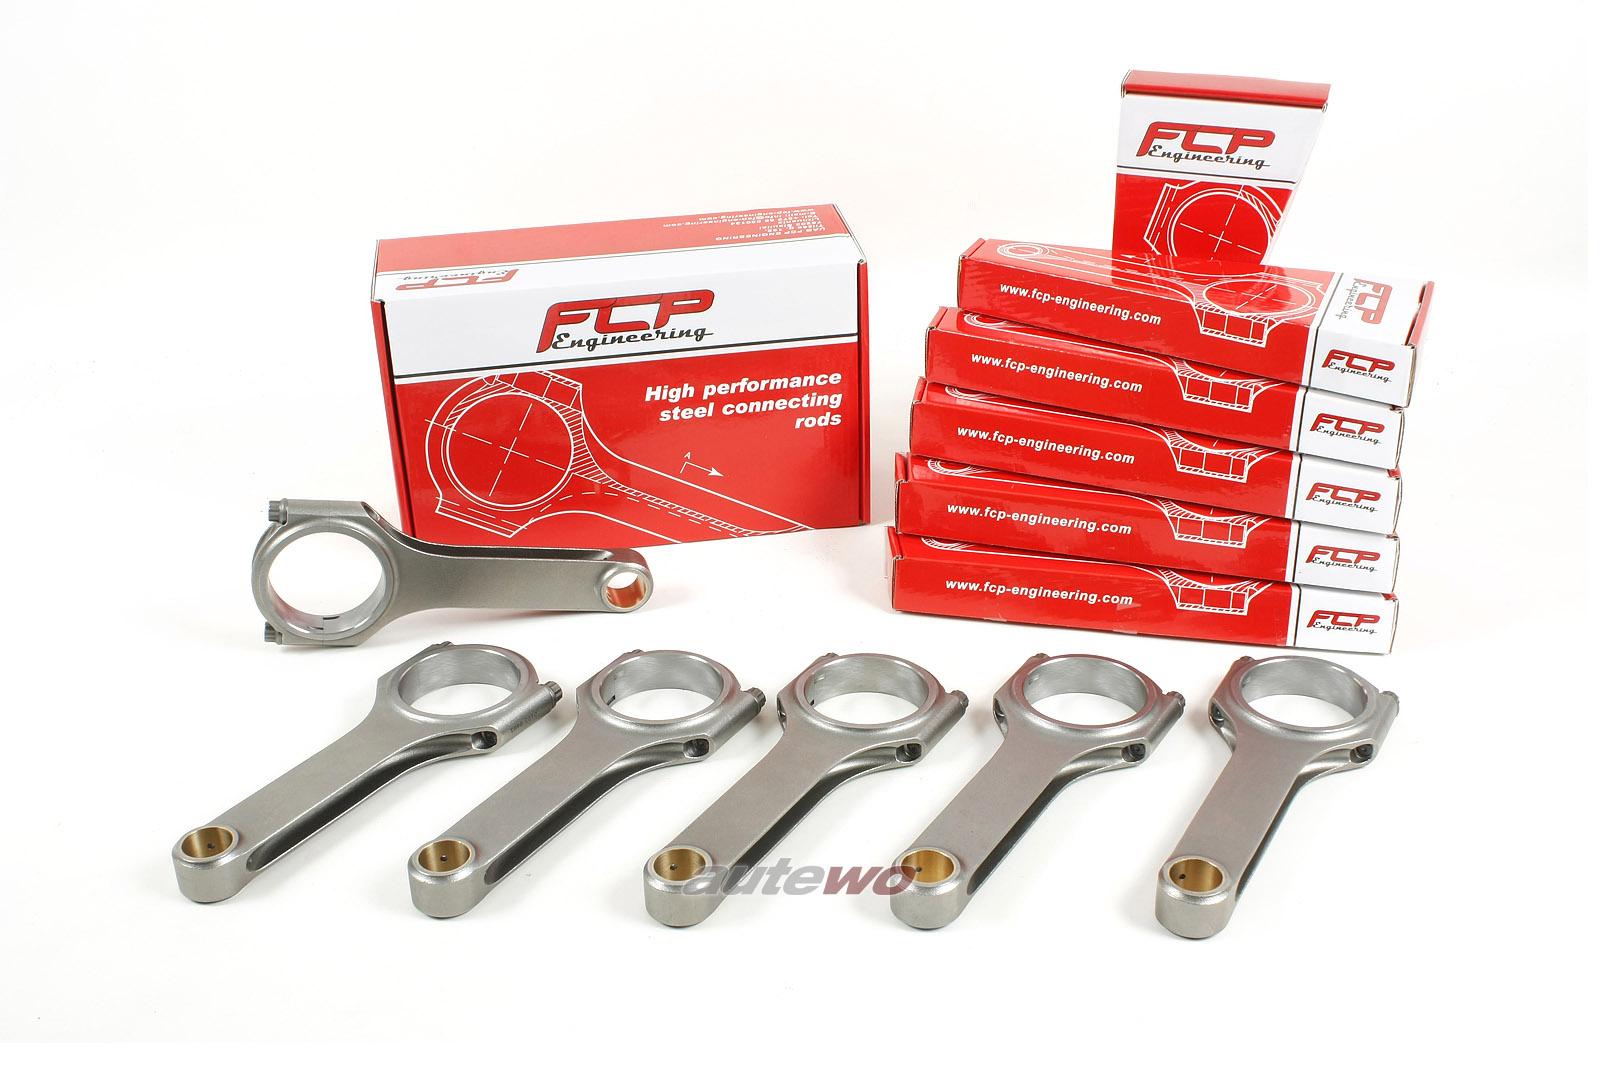 Audi S4 B5/A6 4B 6 Zylinder 2.7l Biturbo FCP H-Schaft-Pleuel 154mm